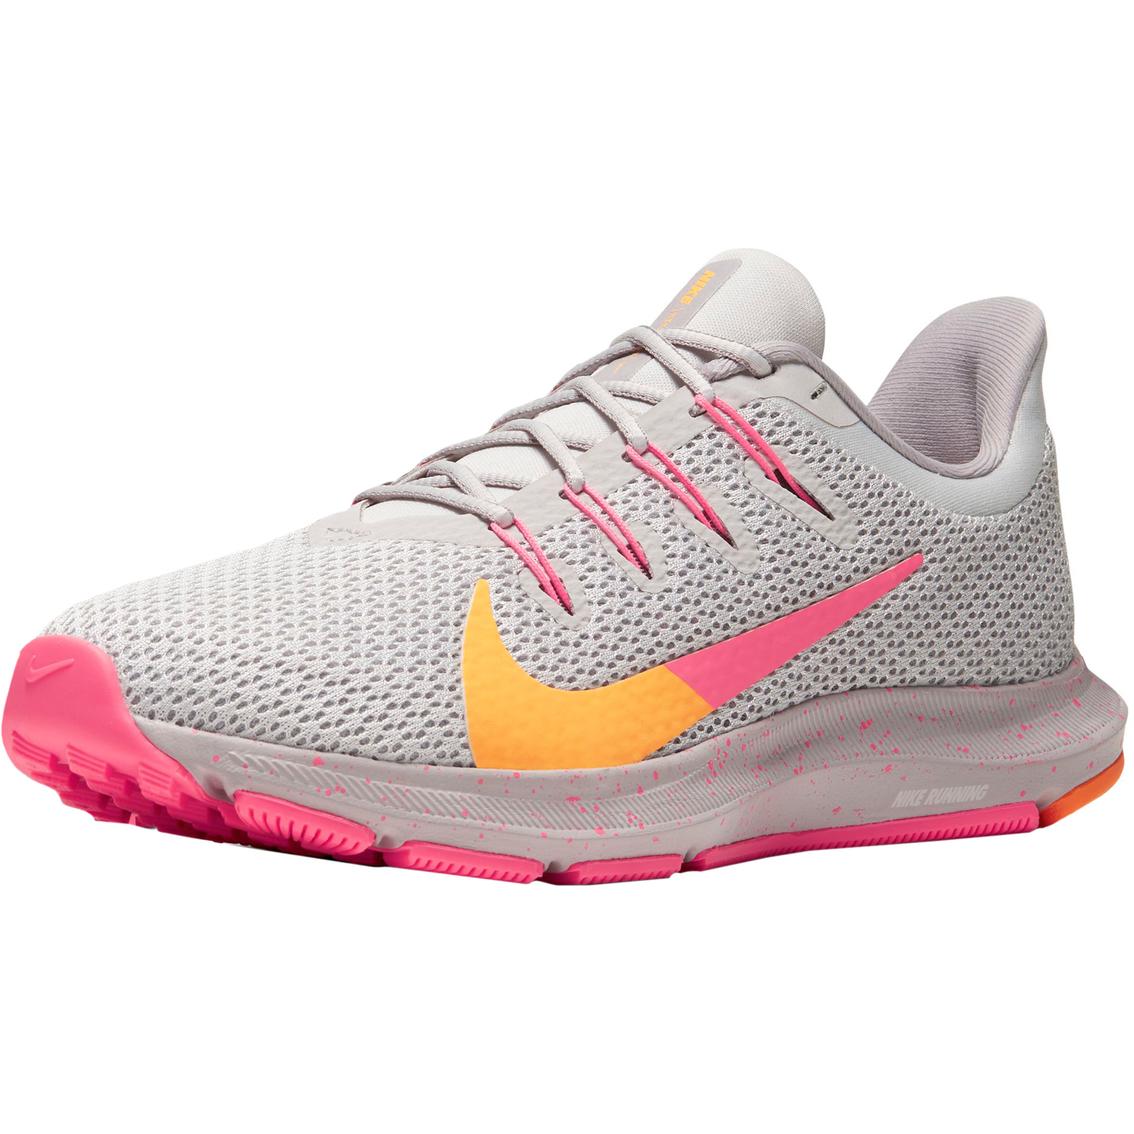 Nike Women's Quest 2 Running Shoes